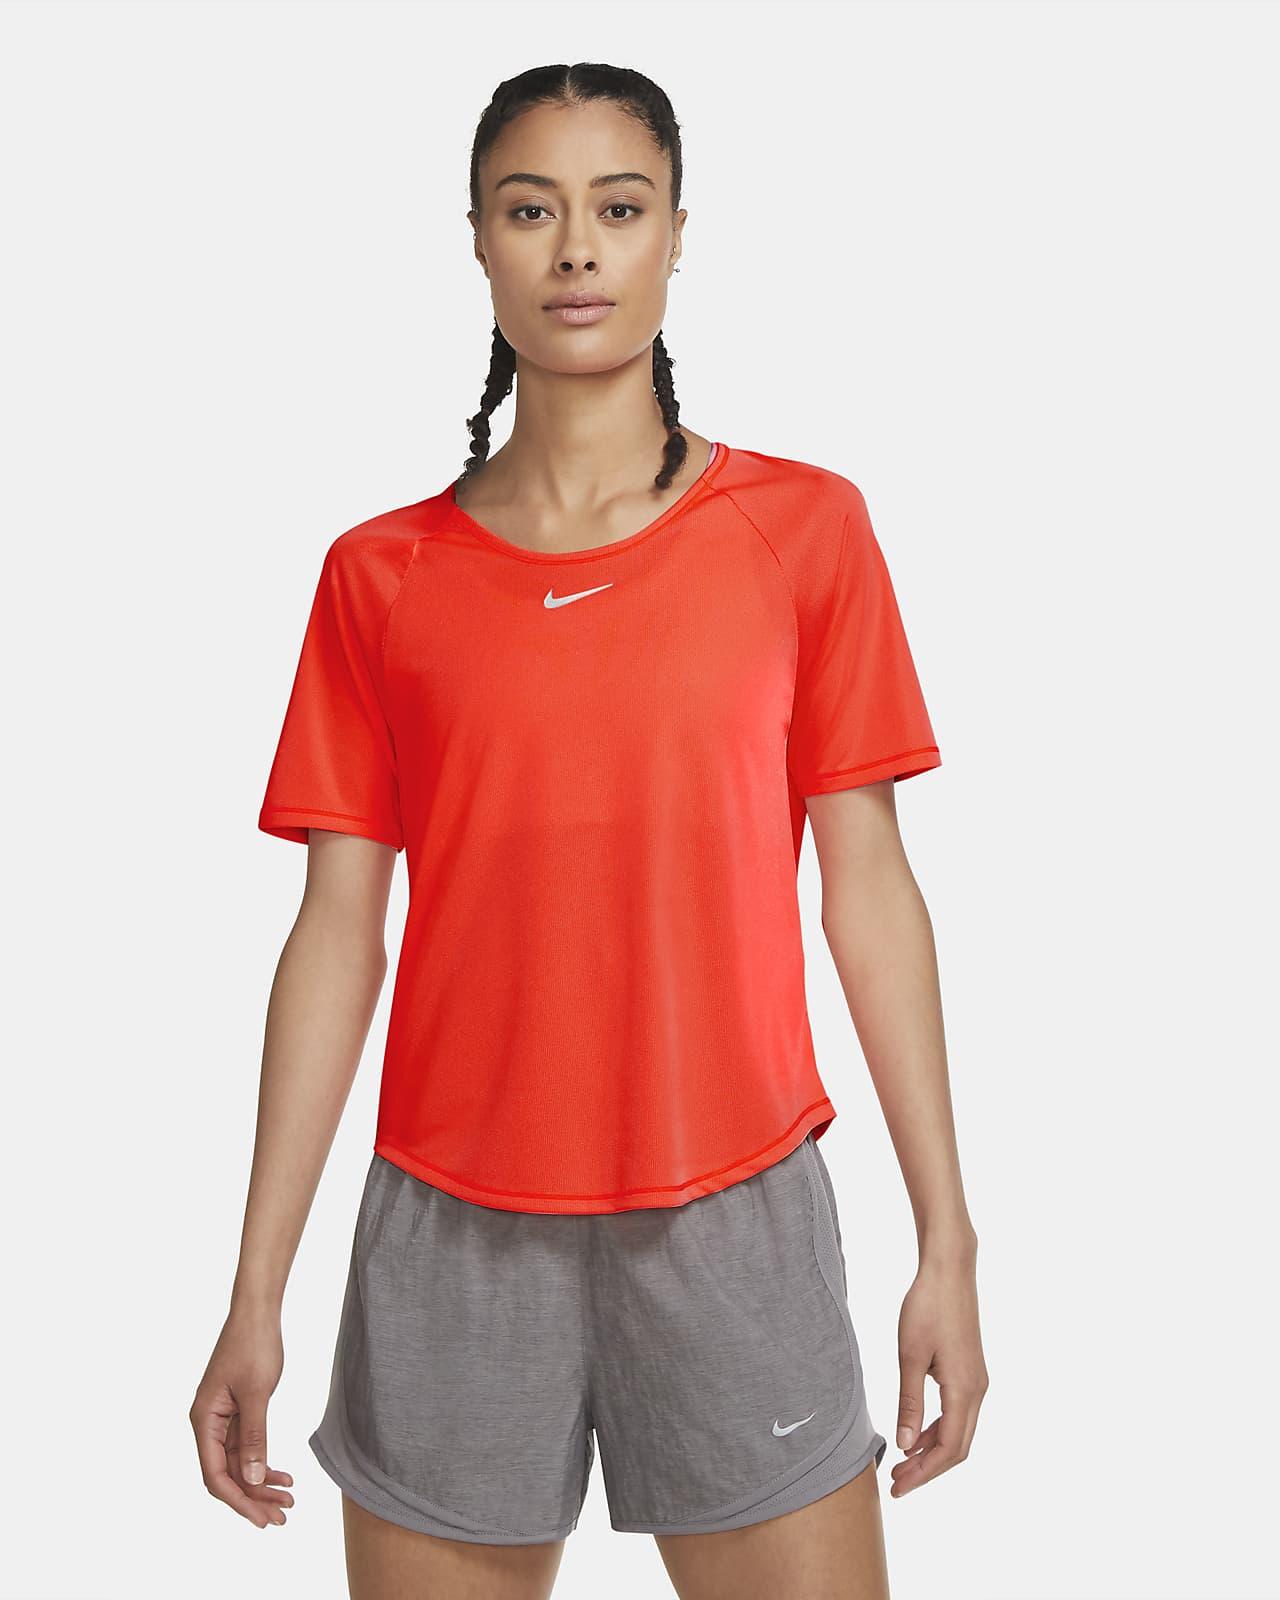 Nike Icon Clash Women's Short-Sleeve Running Top